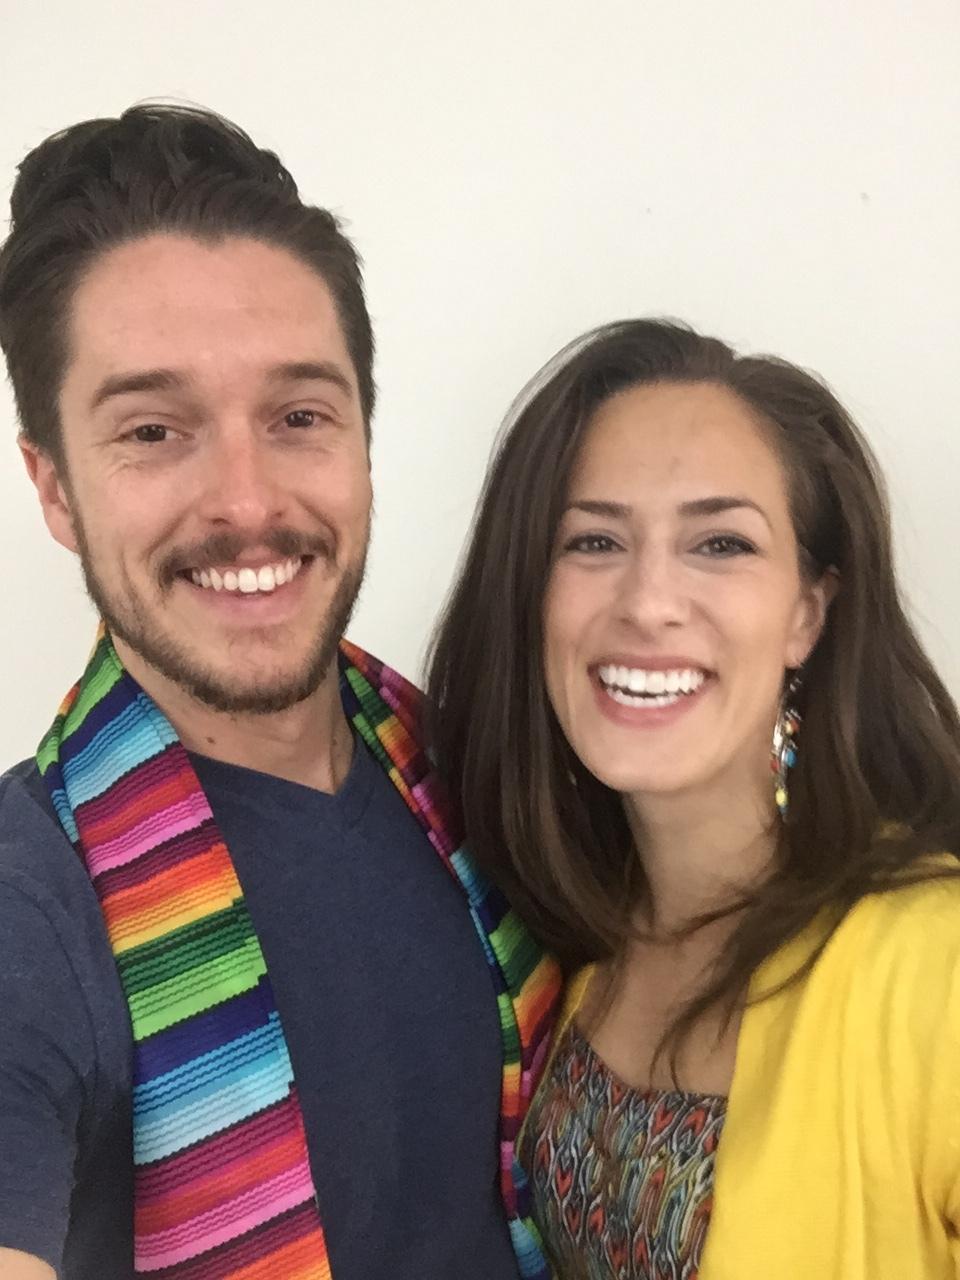 Your hosts, Jonathan & Sydney